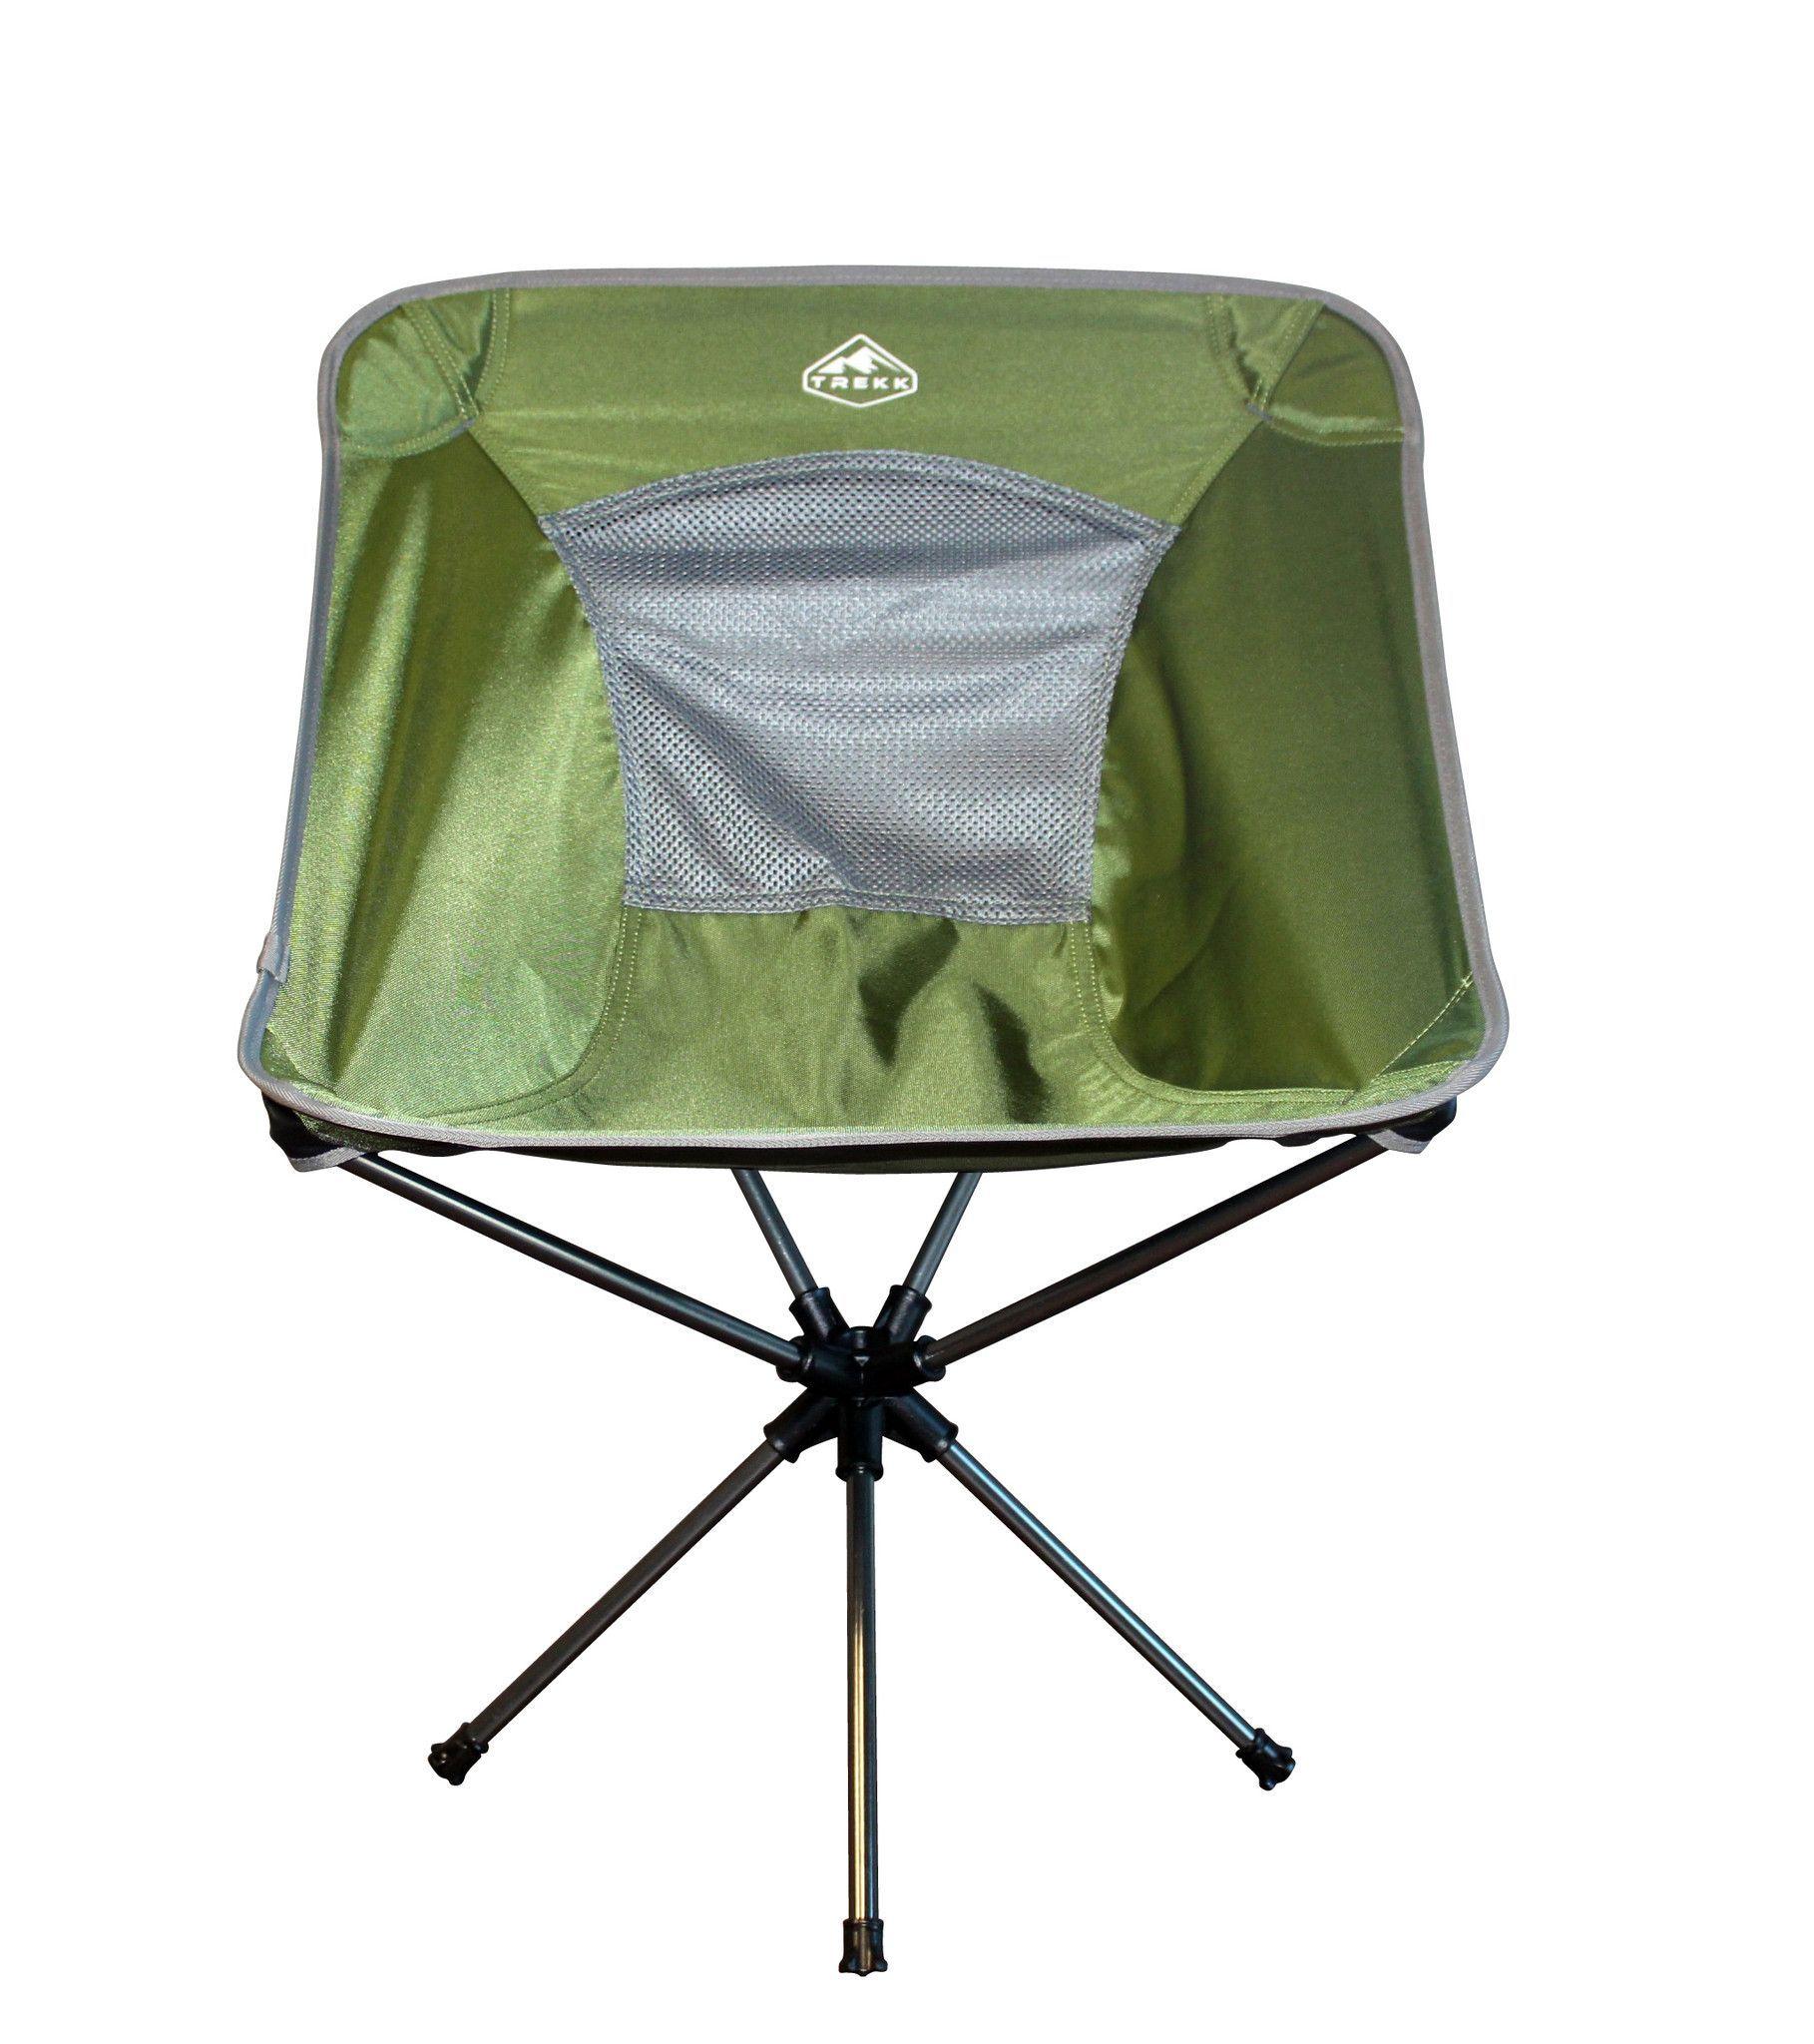 Trekk Ultralight Compact Folding Swivel Camping Chair